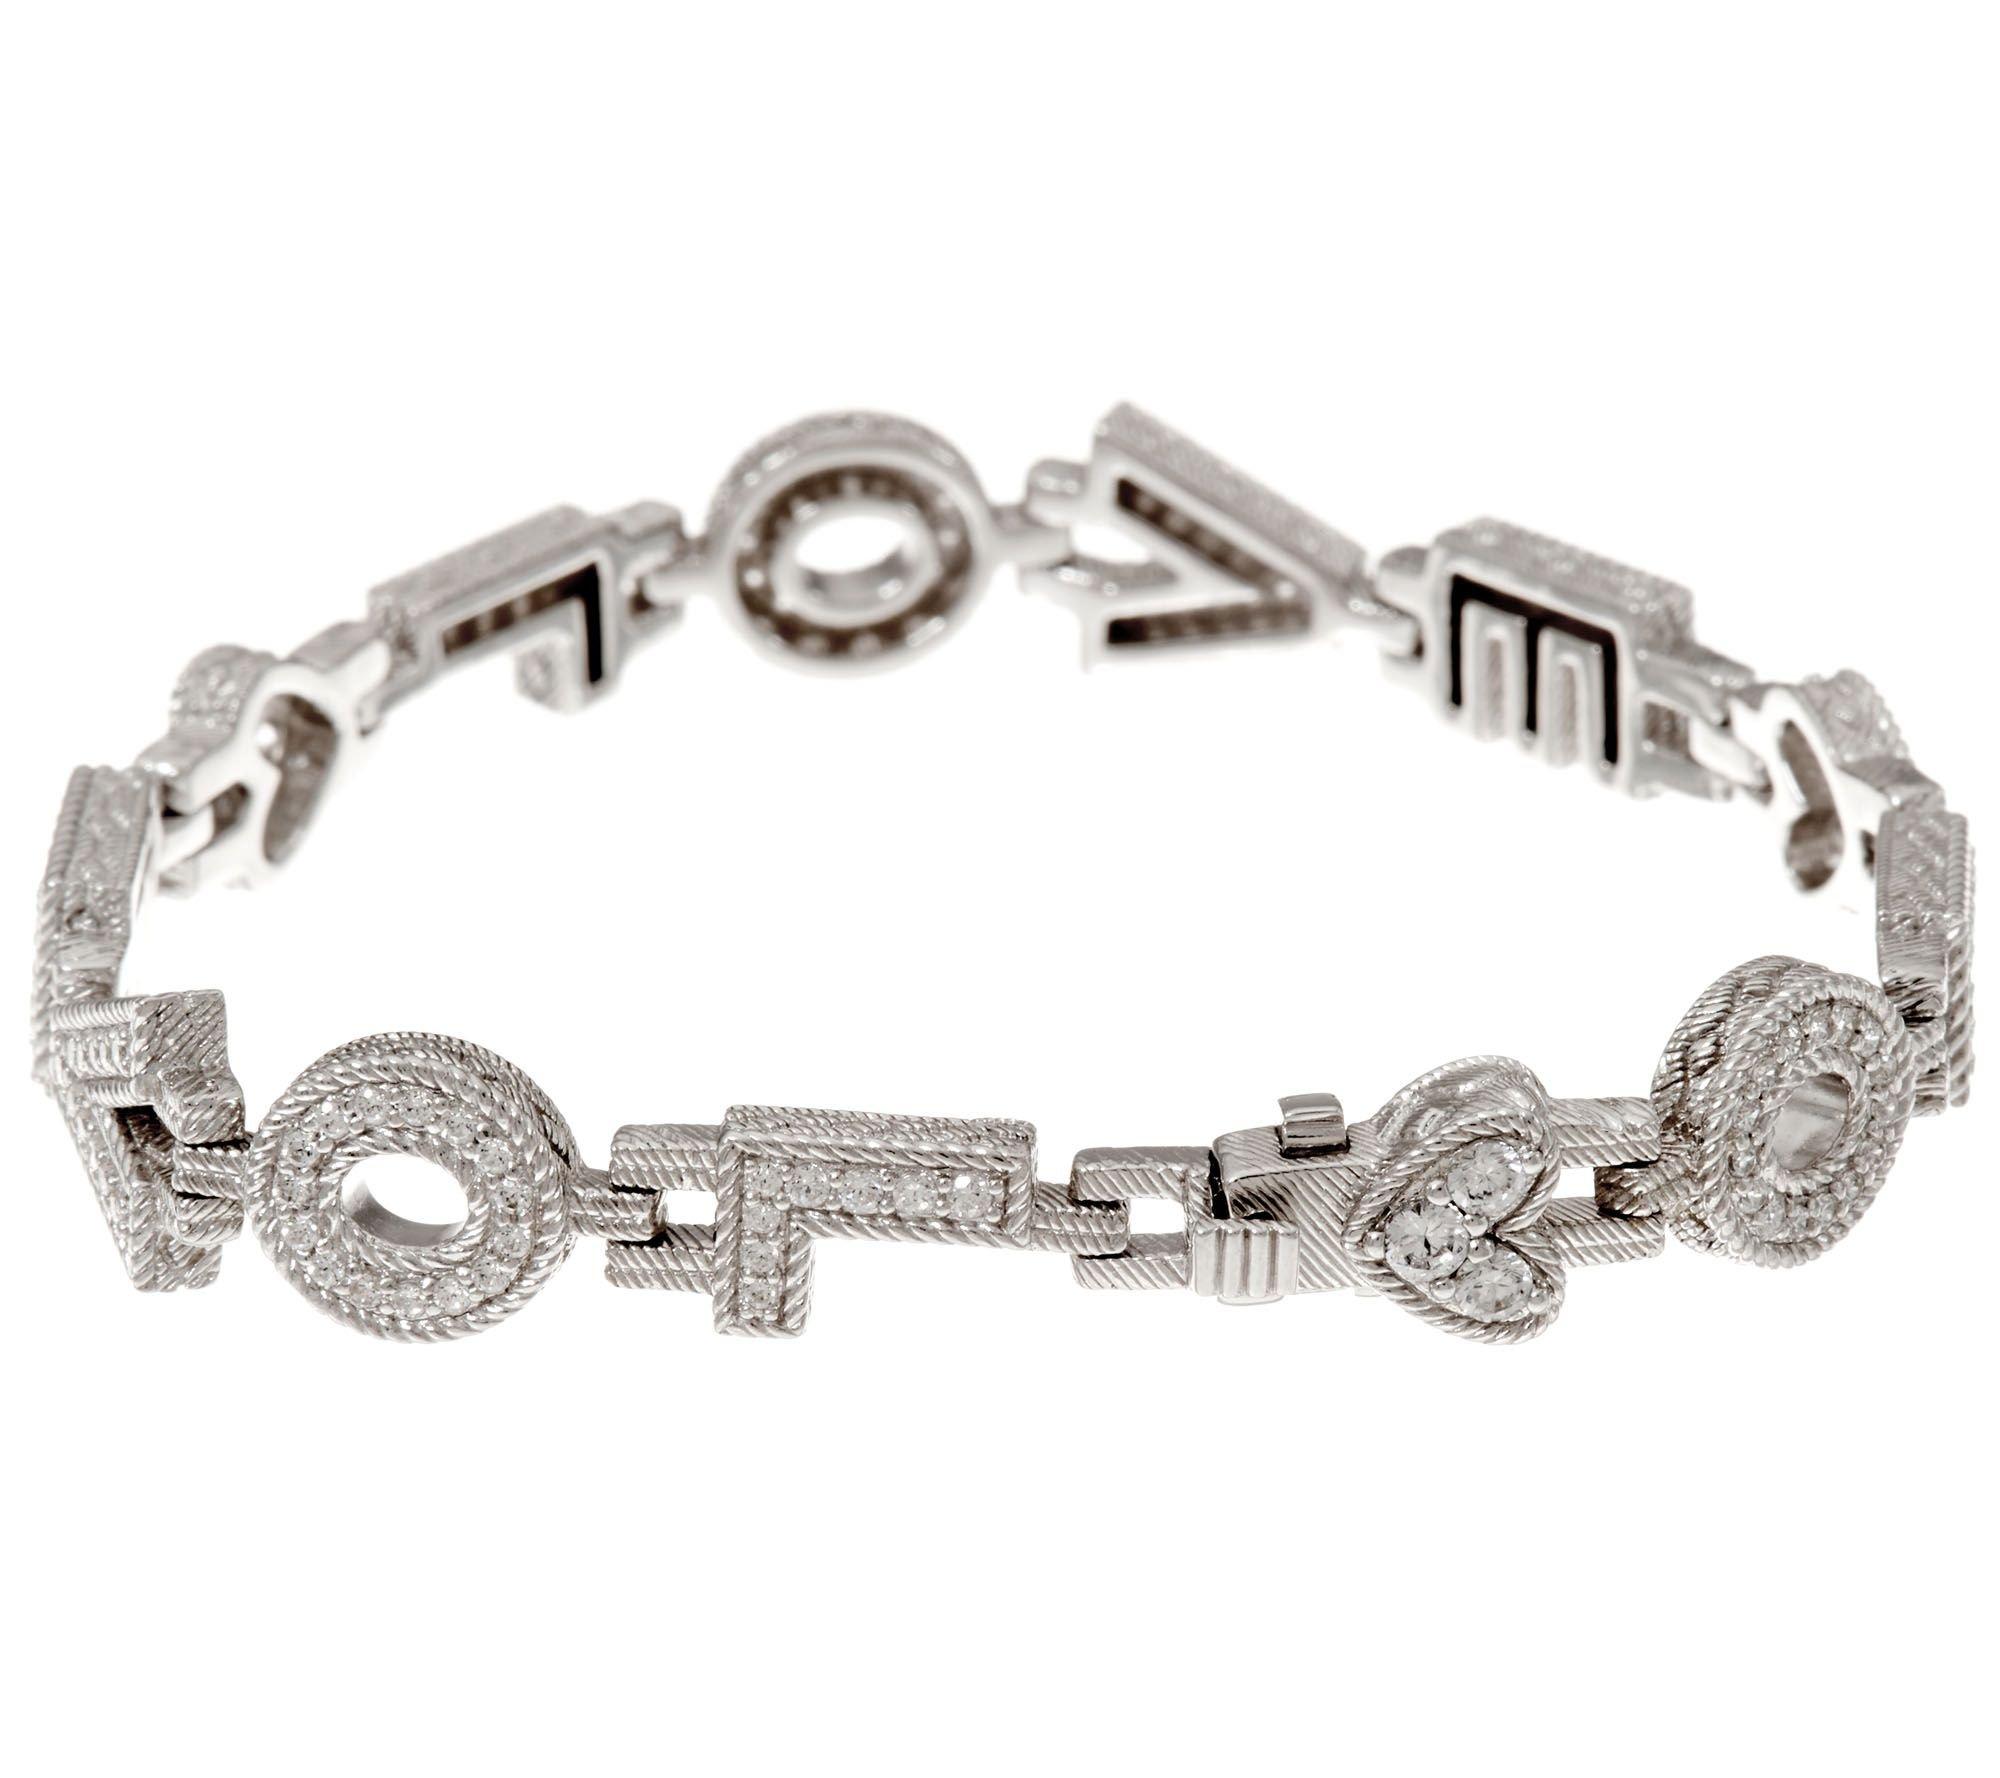 Silvernshine Jewels 1.70 Carat D/VVS1 Diamond Love Design Link Bracelet In 14K White Gold Plated